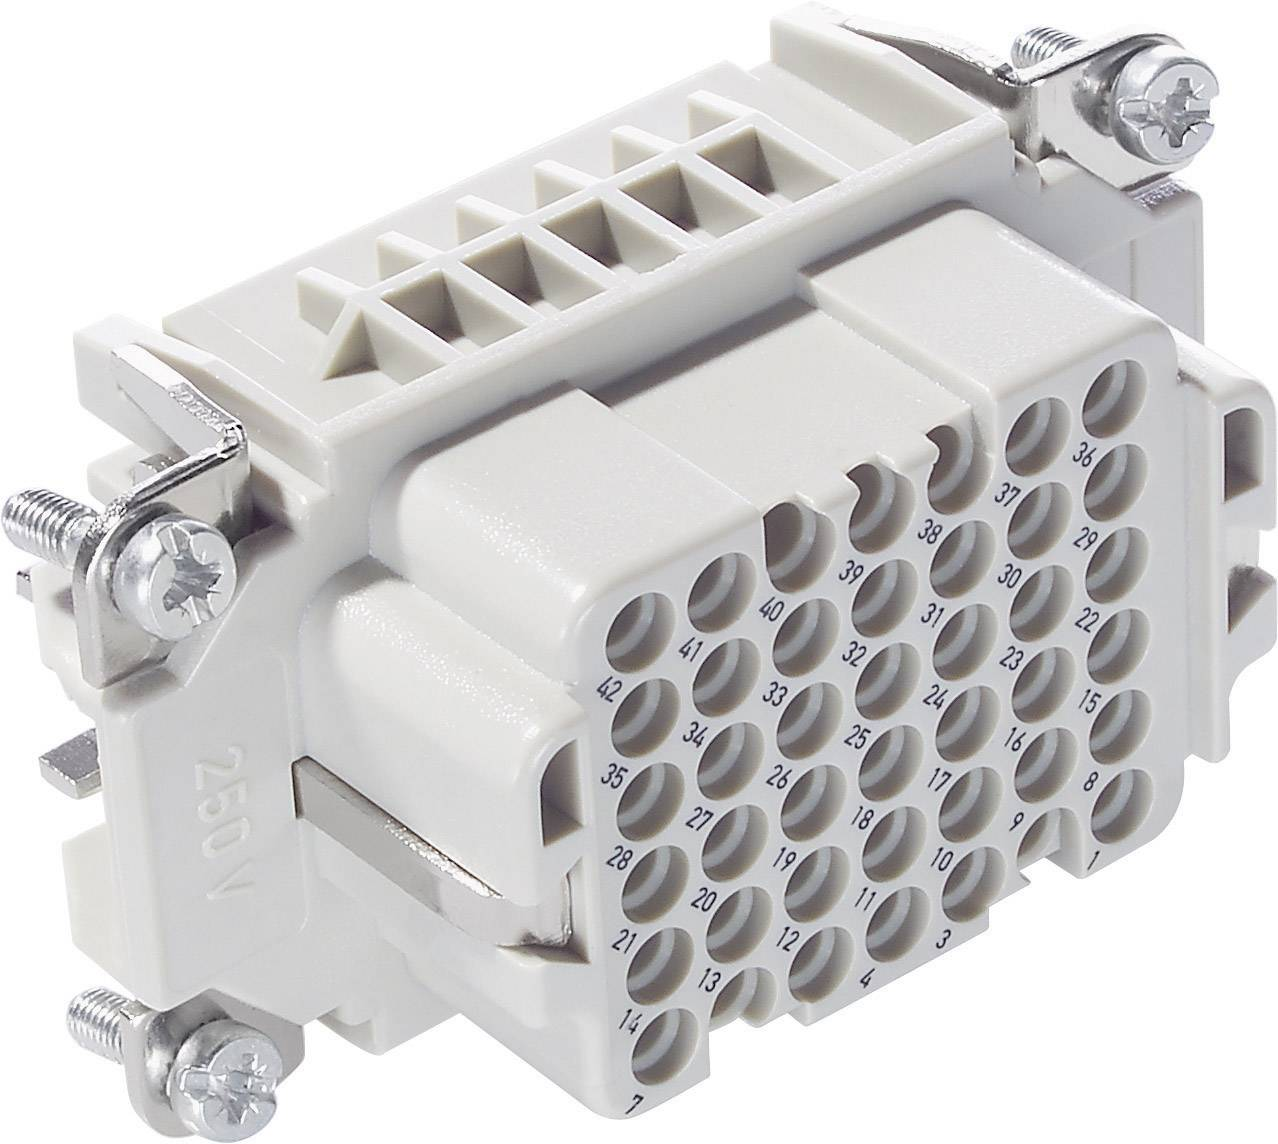 LappKabel EPIC® H-DD 42 BCM (11286100), M25, IP65